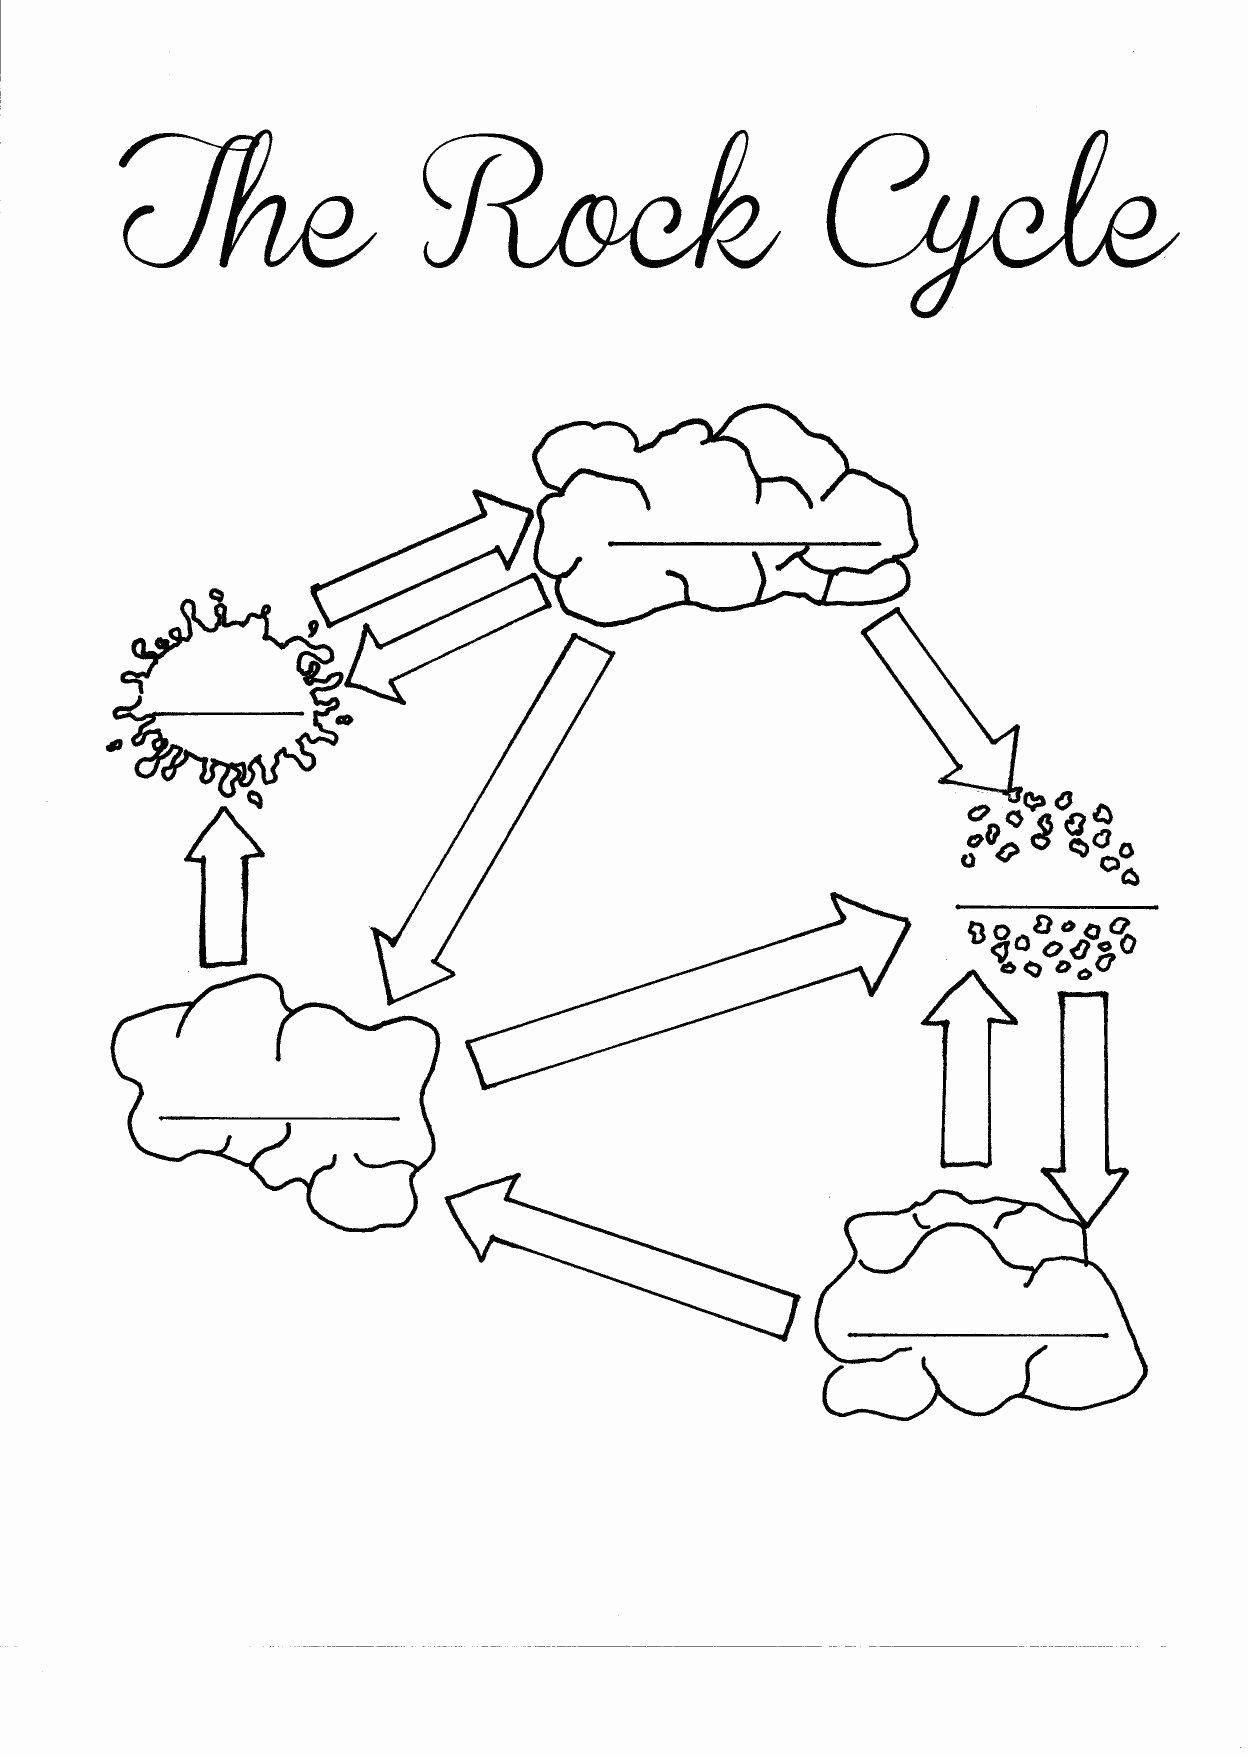 Rock Cycle Worksheet Middle School Ideas Pin by Megan Escobar Olsen On Teaching Middle School